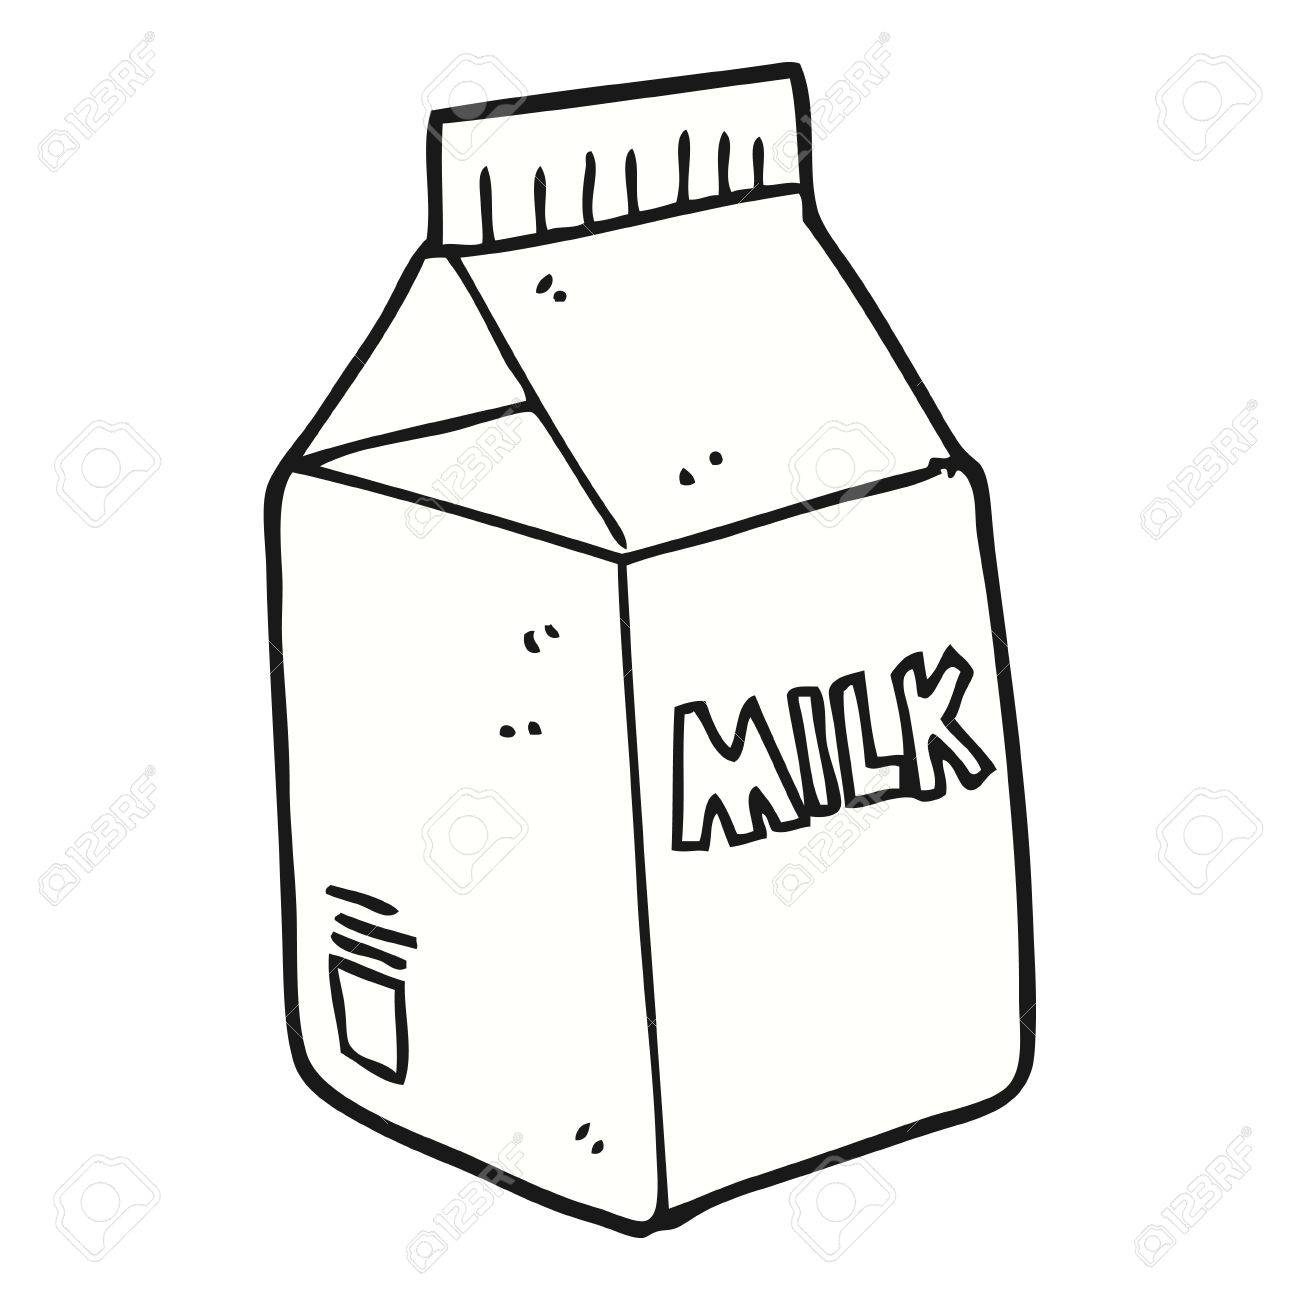 hight resolution of 1300x1300 freehand drawn cartoon milk carton royalty free cliparts vectors